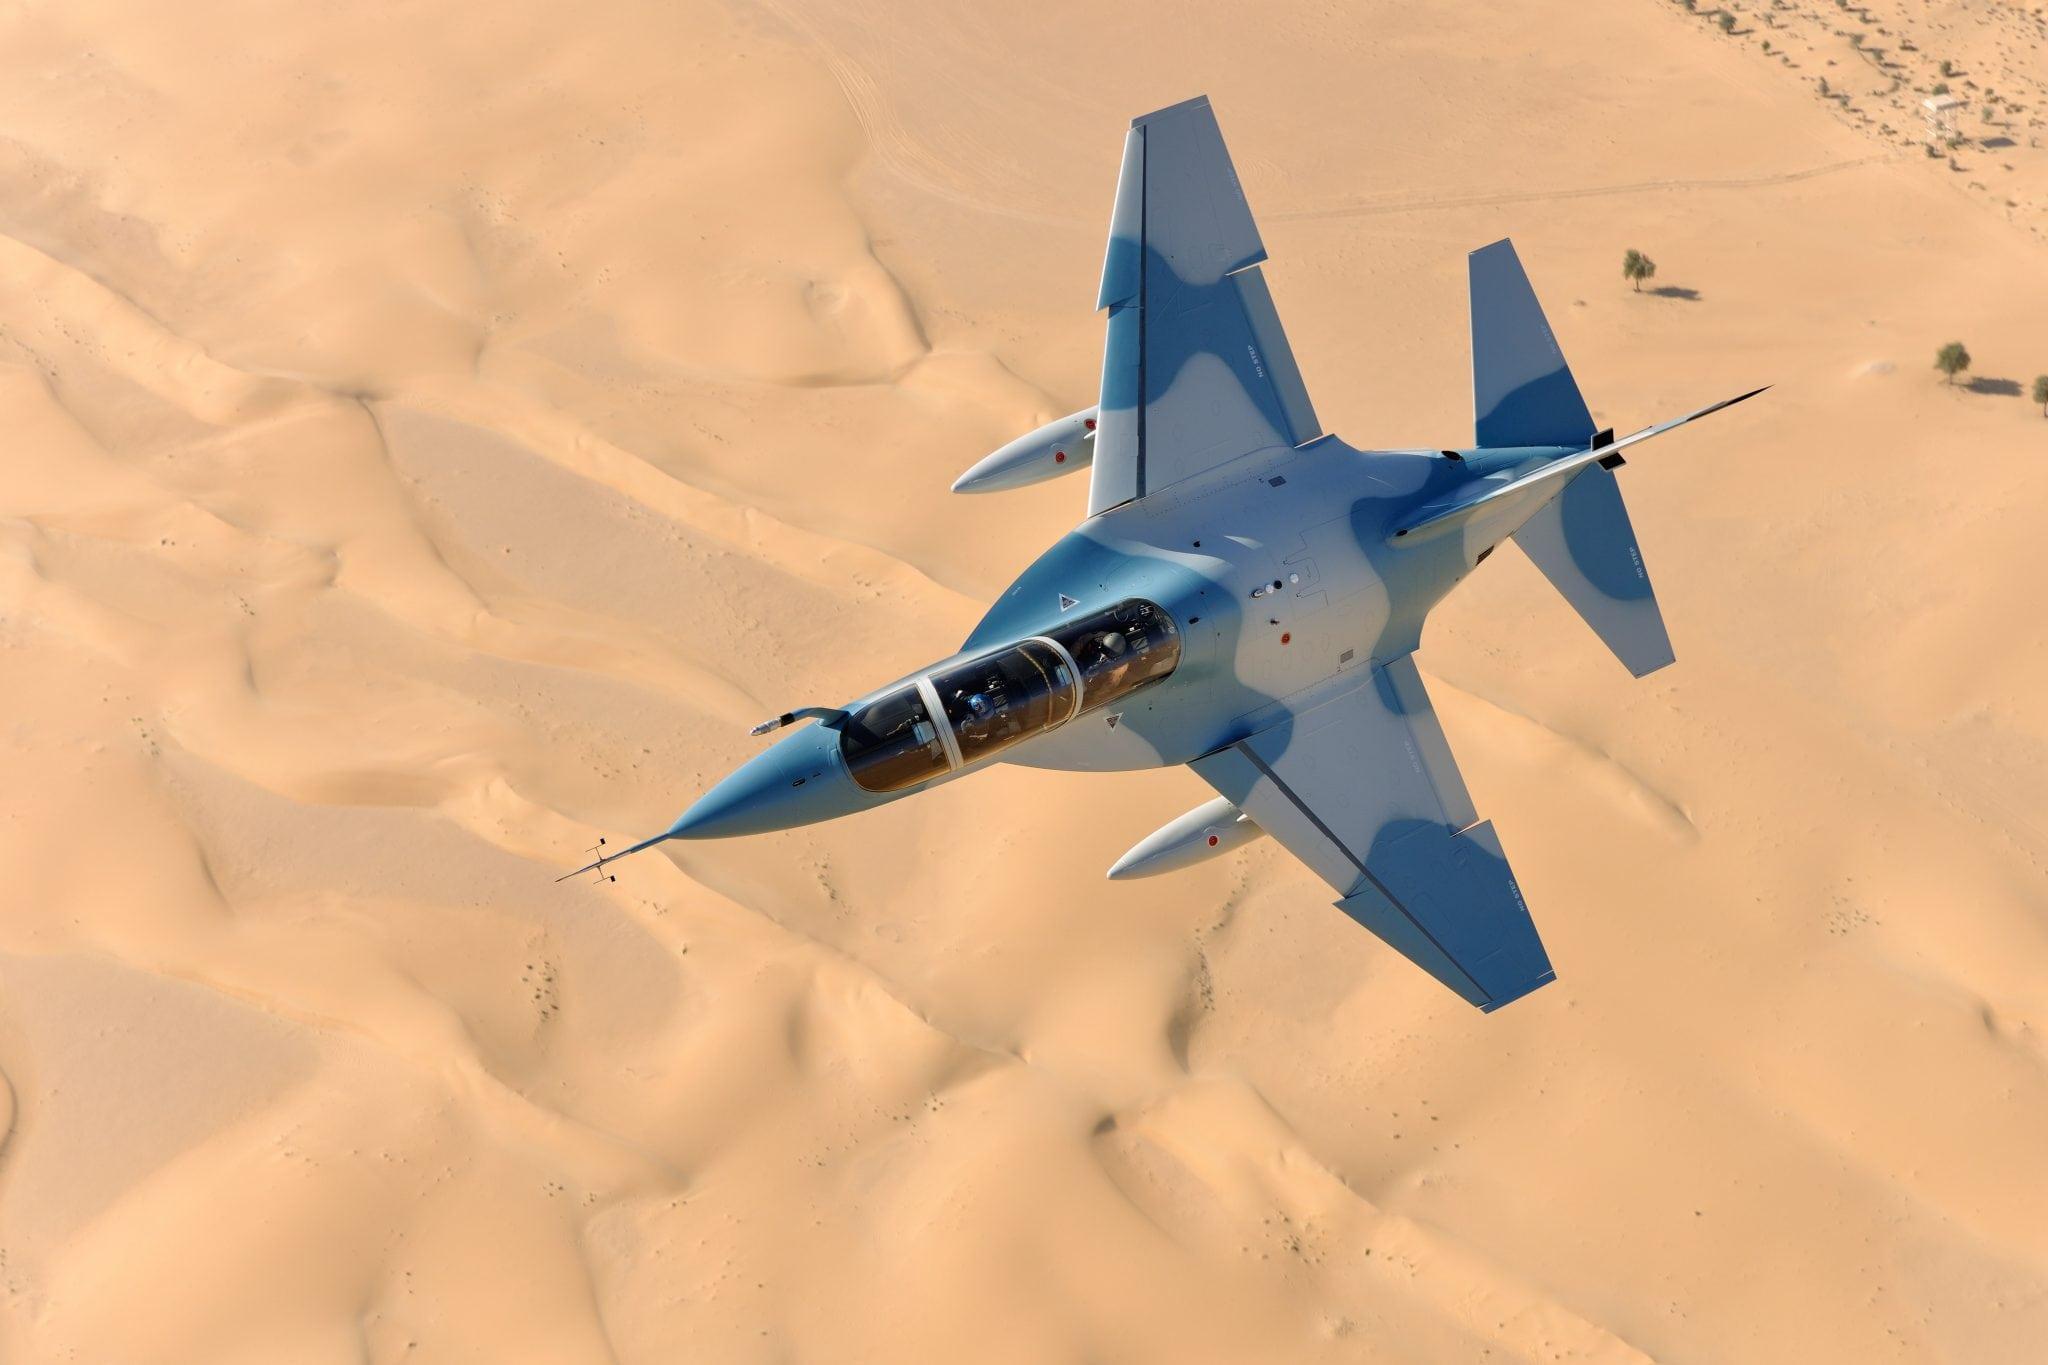 Poland's new M346 advanced jet trainer in flight